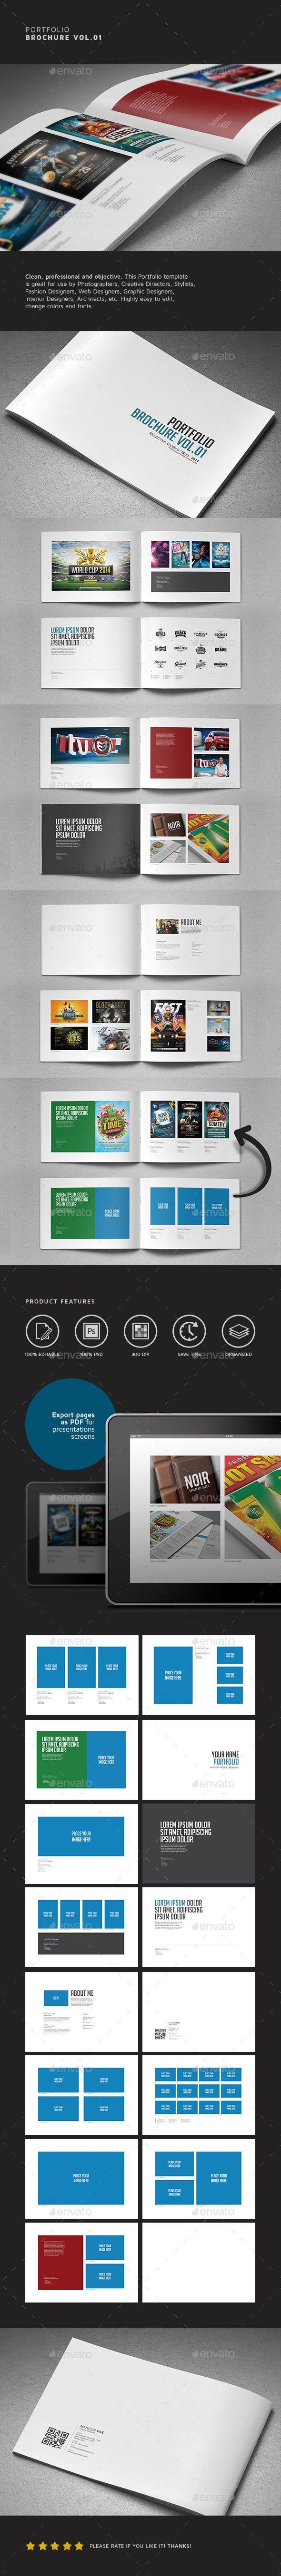 Portfolio Brochure Vol.01  #lines #logo #minimal • Available here → http://graphicriver.net/item/portfolio-brochure-vol01/7103852?s_rank=128&ref=pxcr